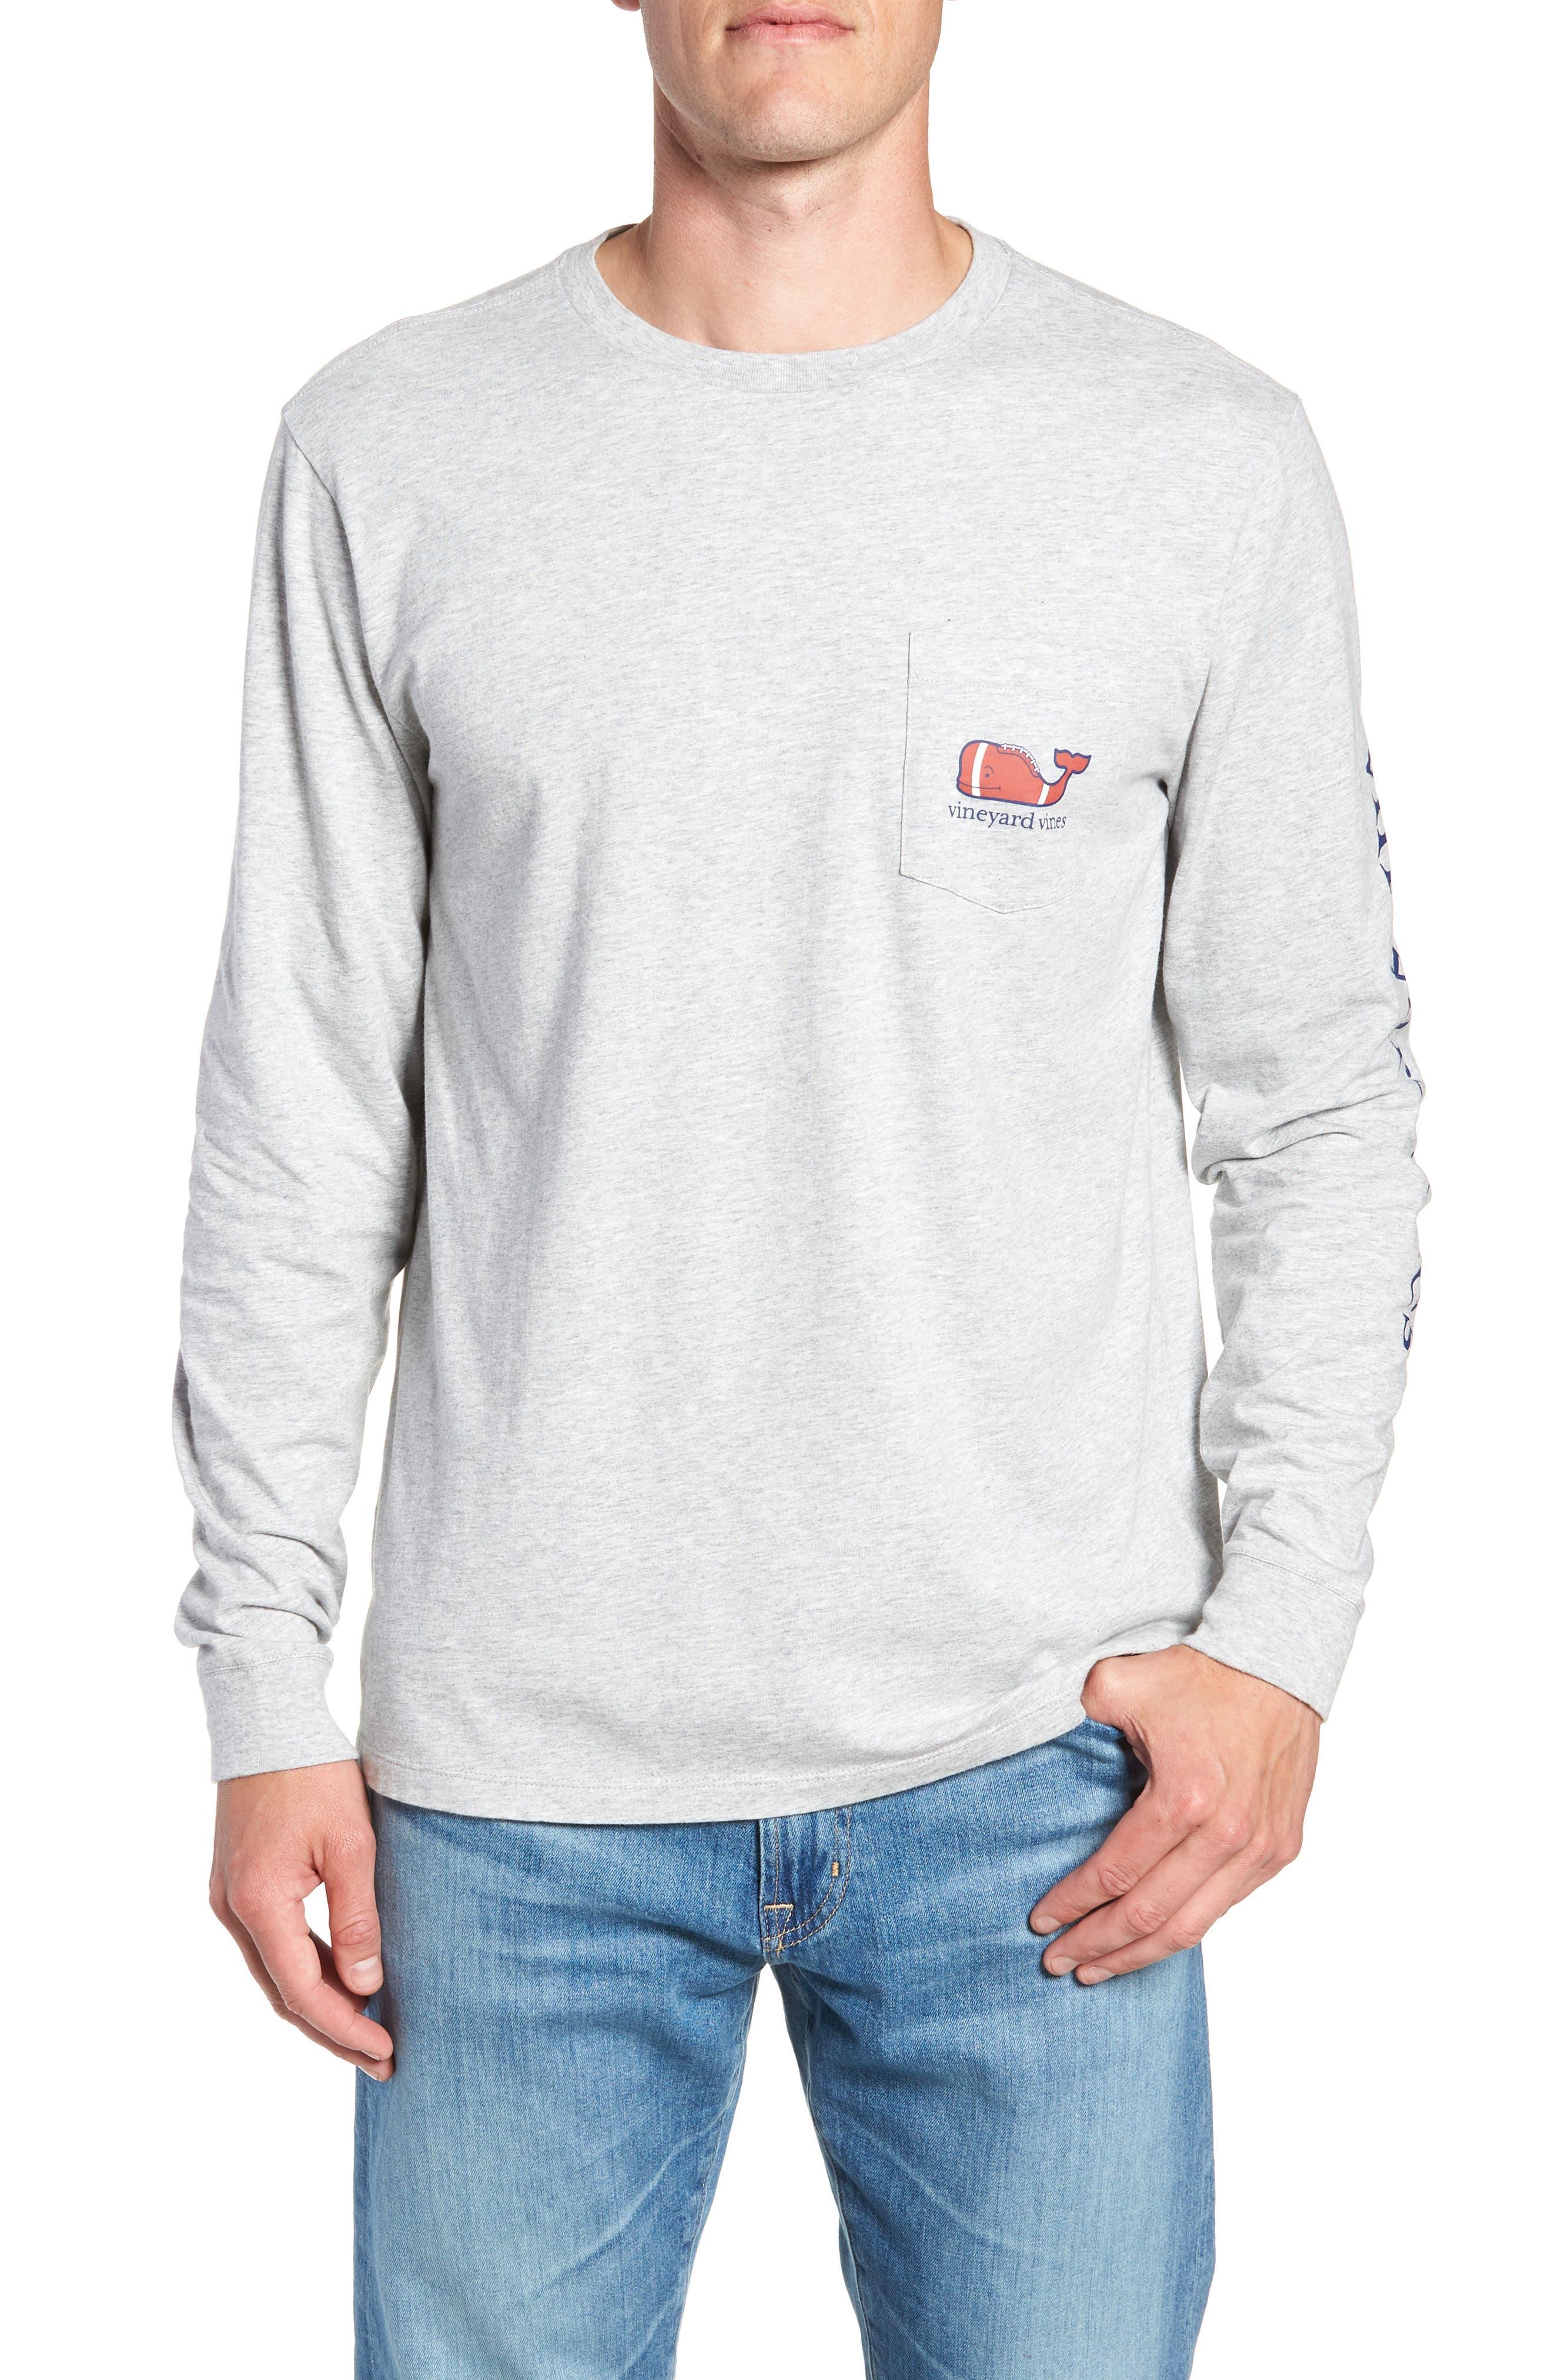 Football Whale Long Sleeve Pocket T-Shirt,                             Main thumbnail 1, color,                             GRAY HEATHER